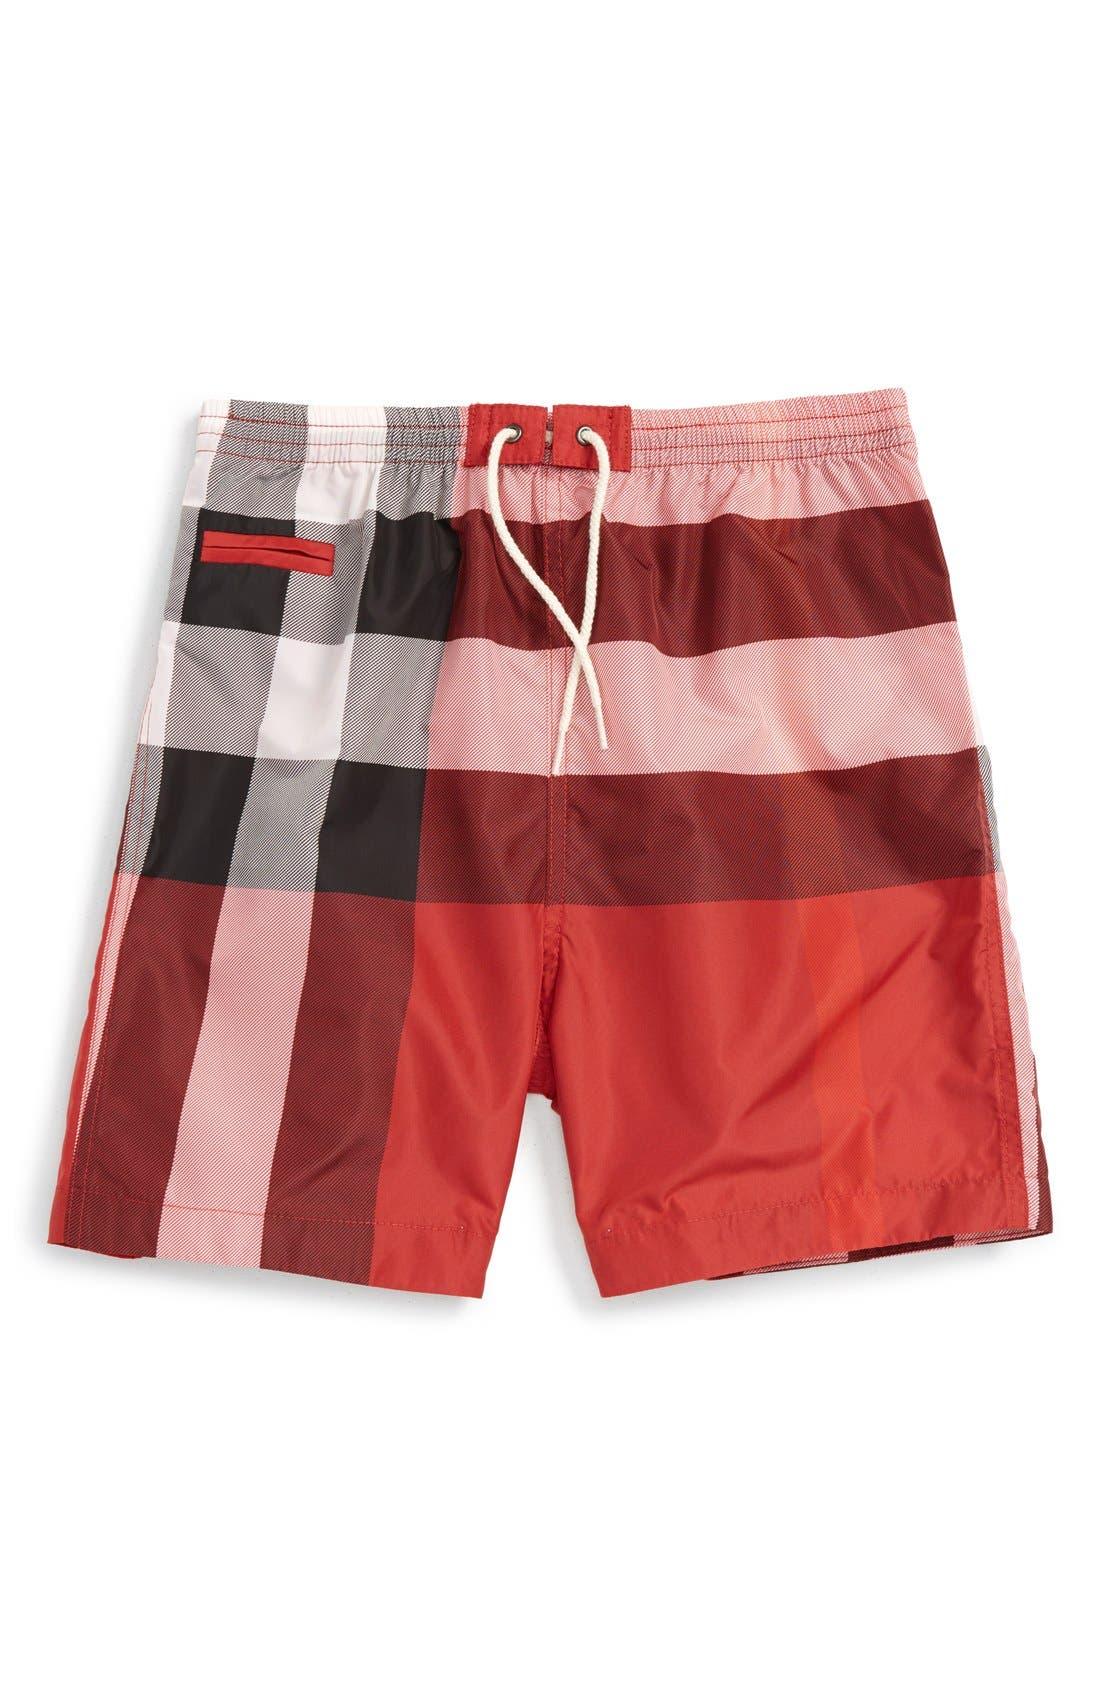 'Saxon' Check Print Swim Trunks,                         Main,                         color, Parade Red